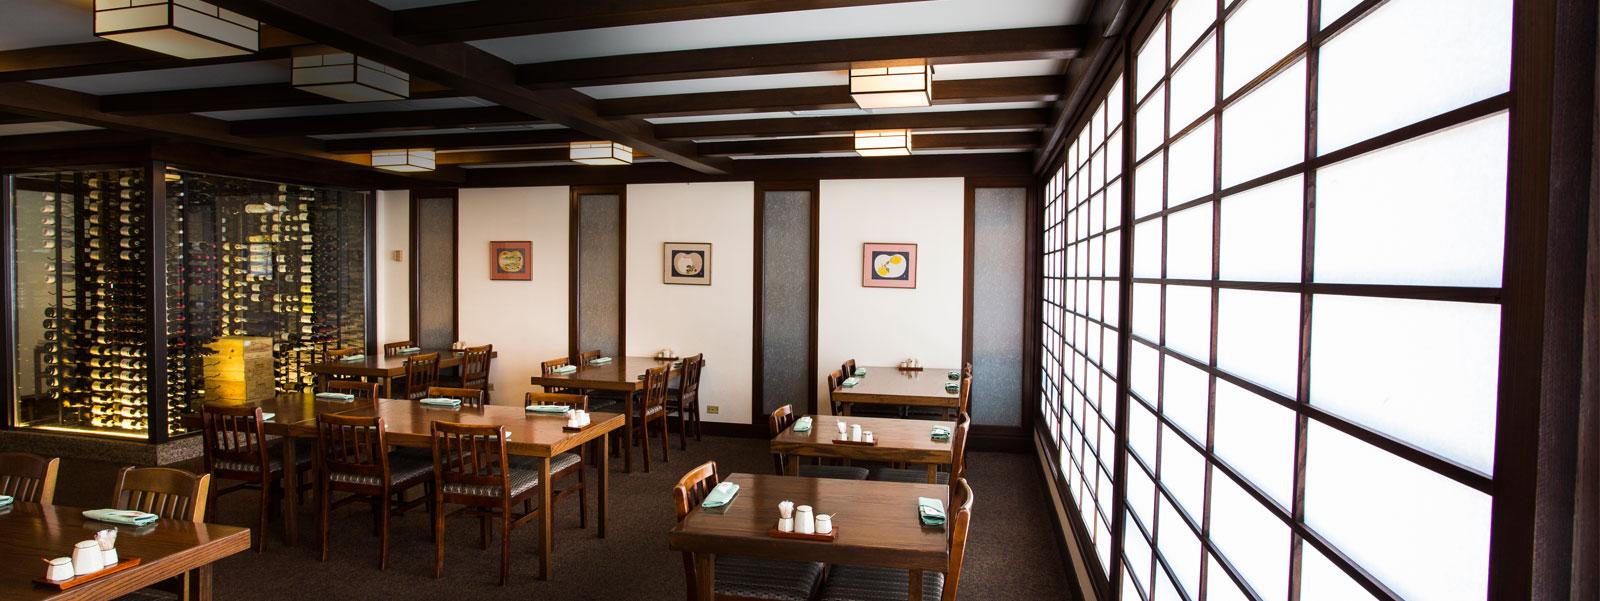 Restaurant Suntory | レストラン・サントリー | ハワイ・ワイキキ - Authentic Japanese dishes, from shabu-shabu to sushi, tenppanyaki and elegant kaiseki dinners.